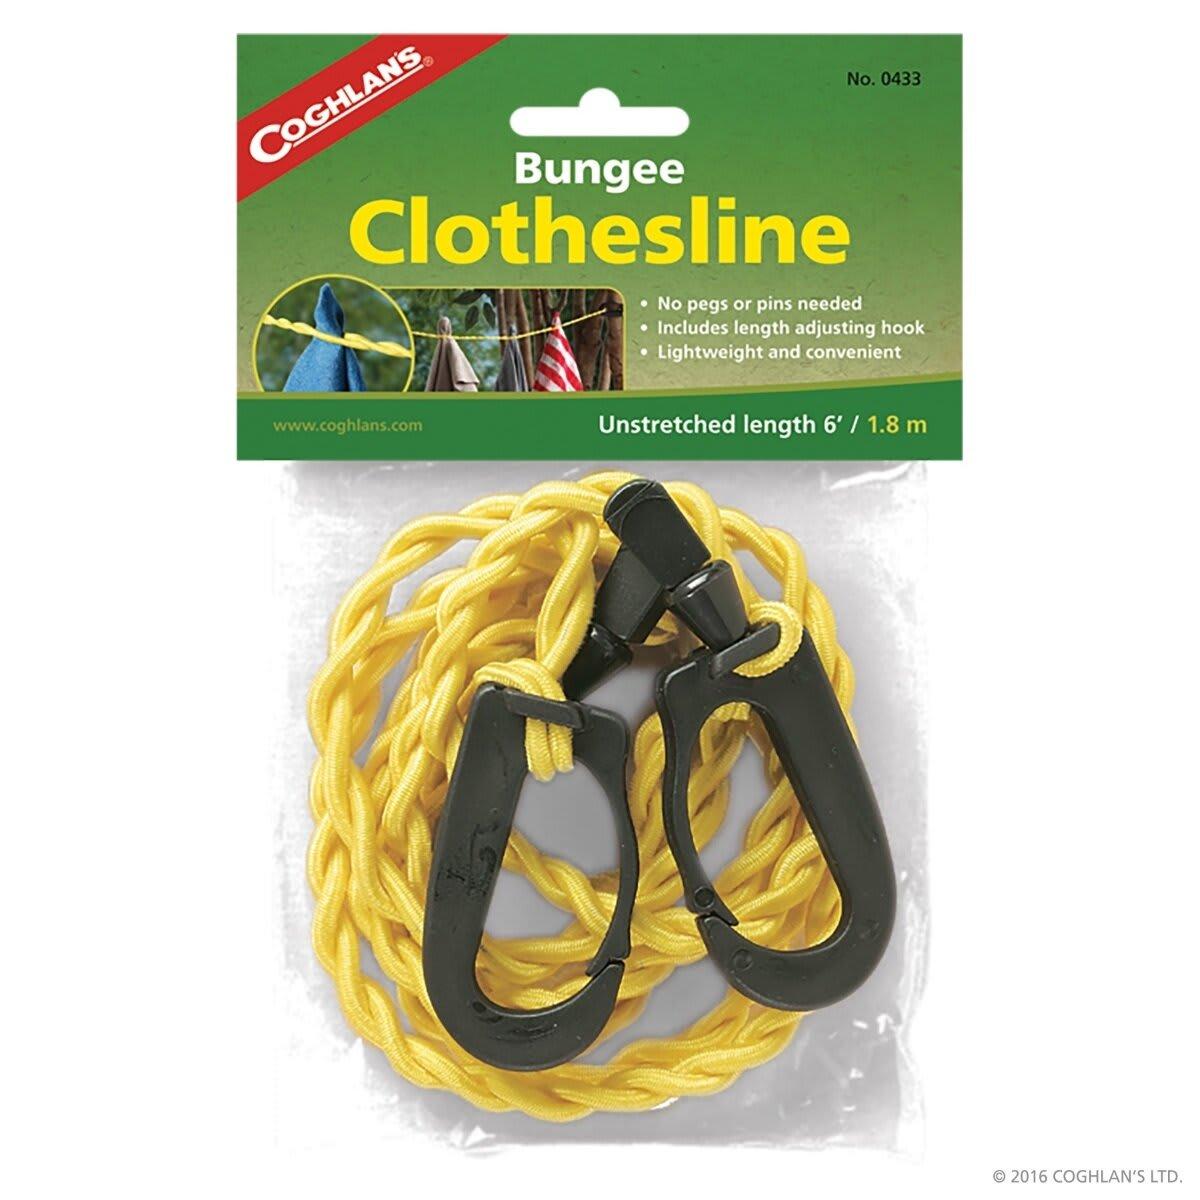 Coghlans Bungee Clothesline